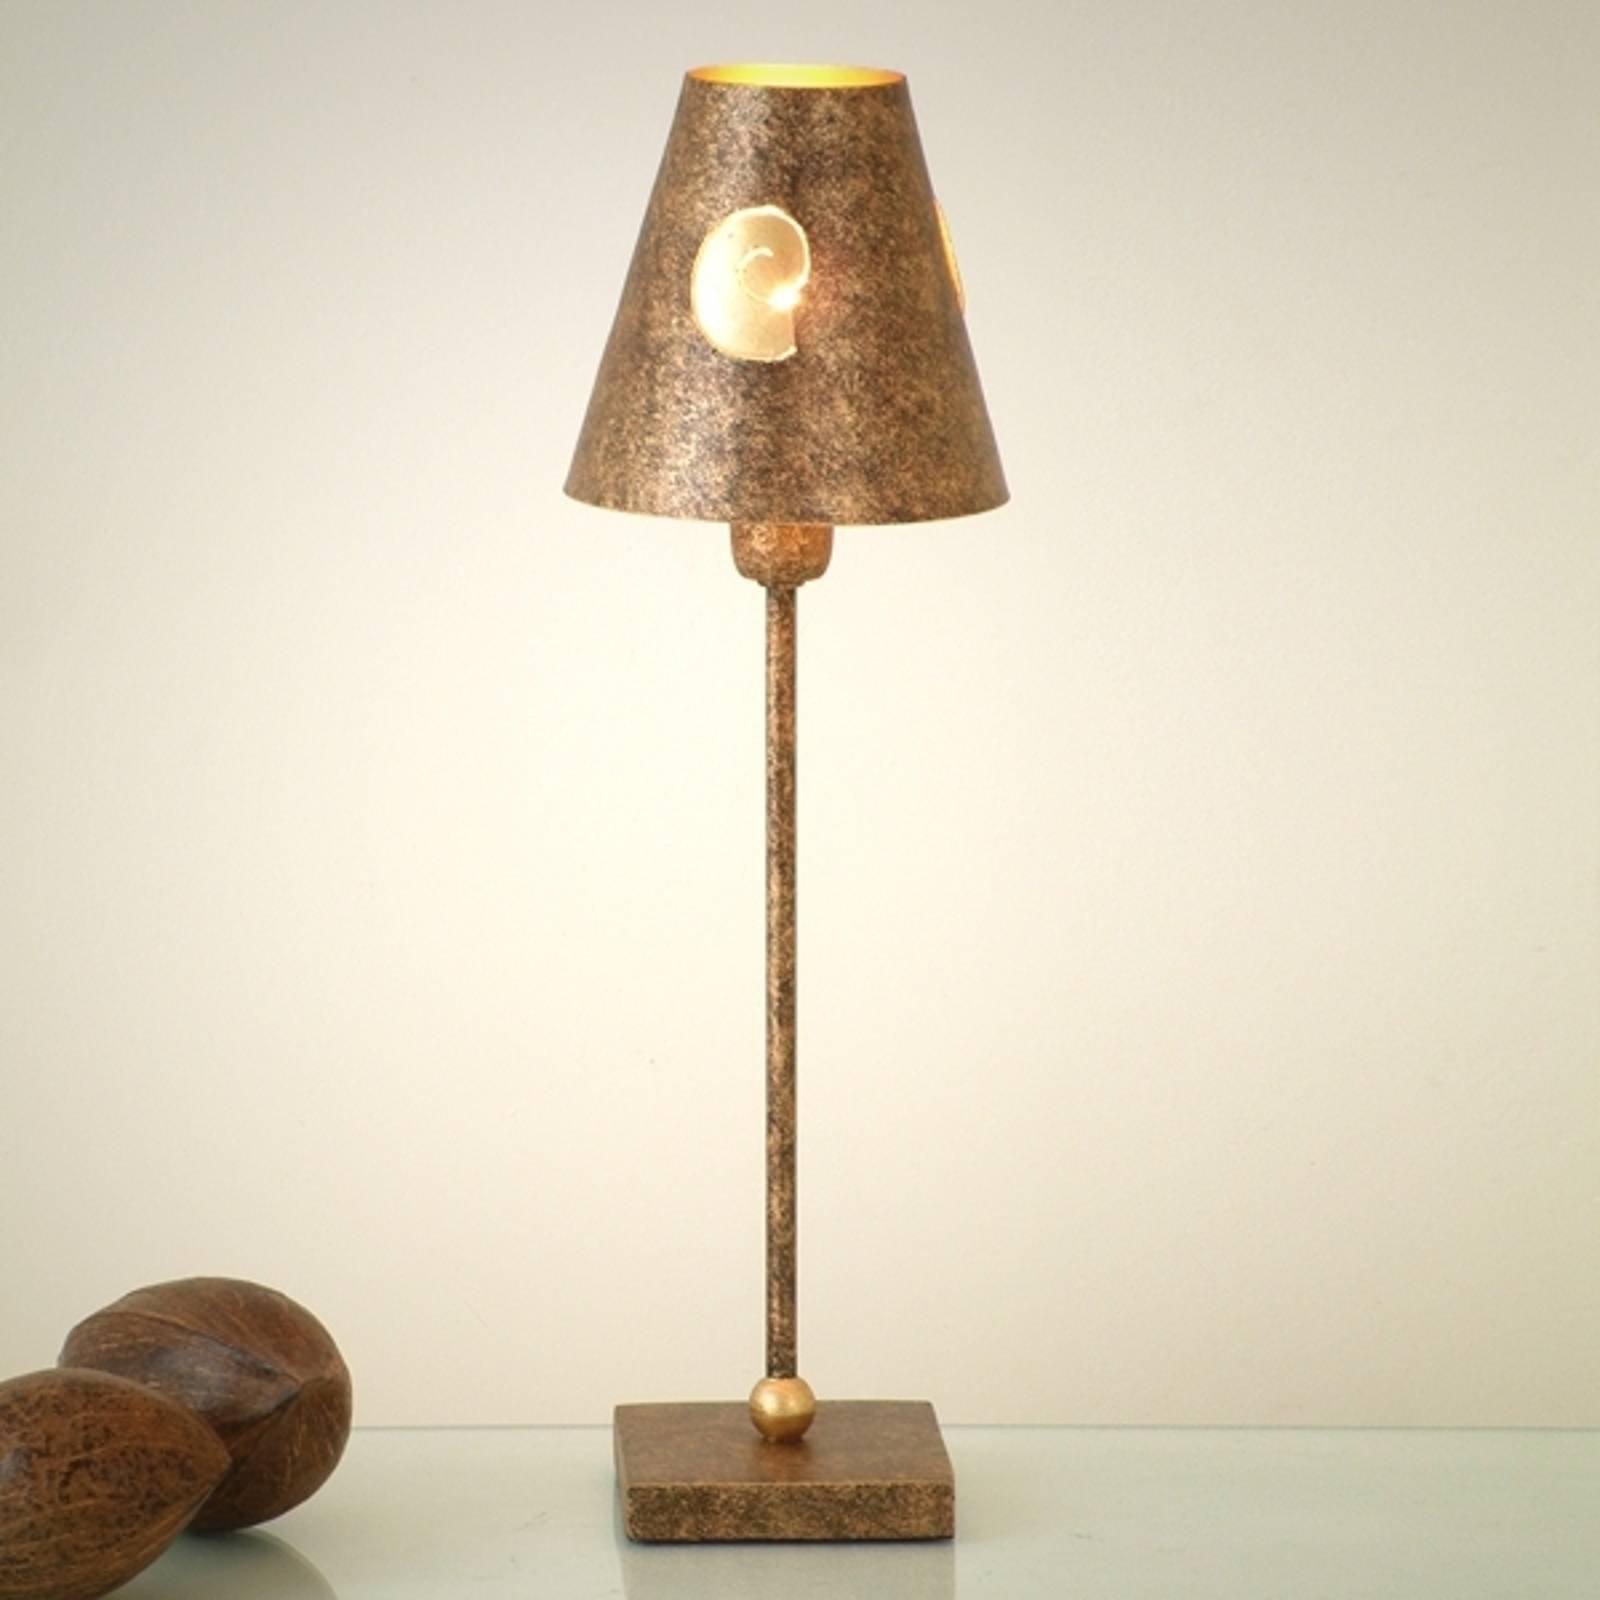 Stilfull ESEMPIO bordlampe liten